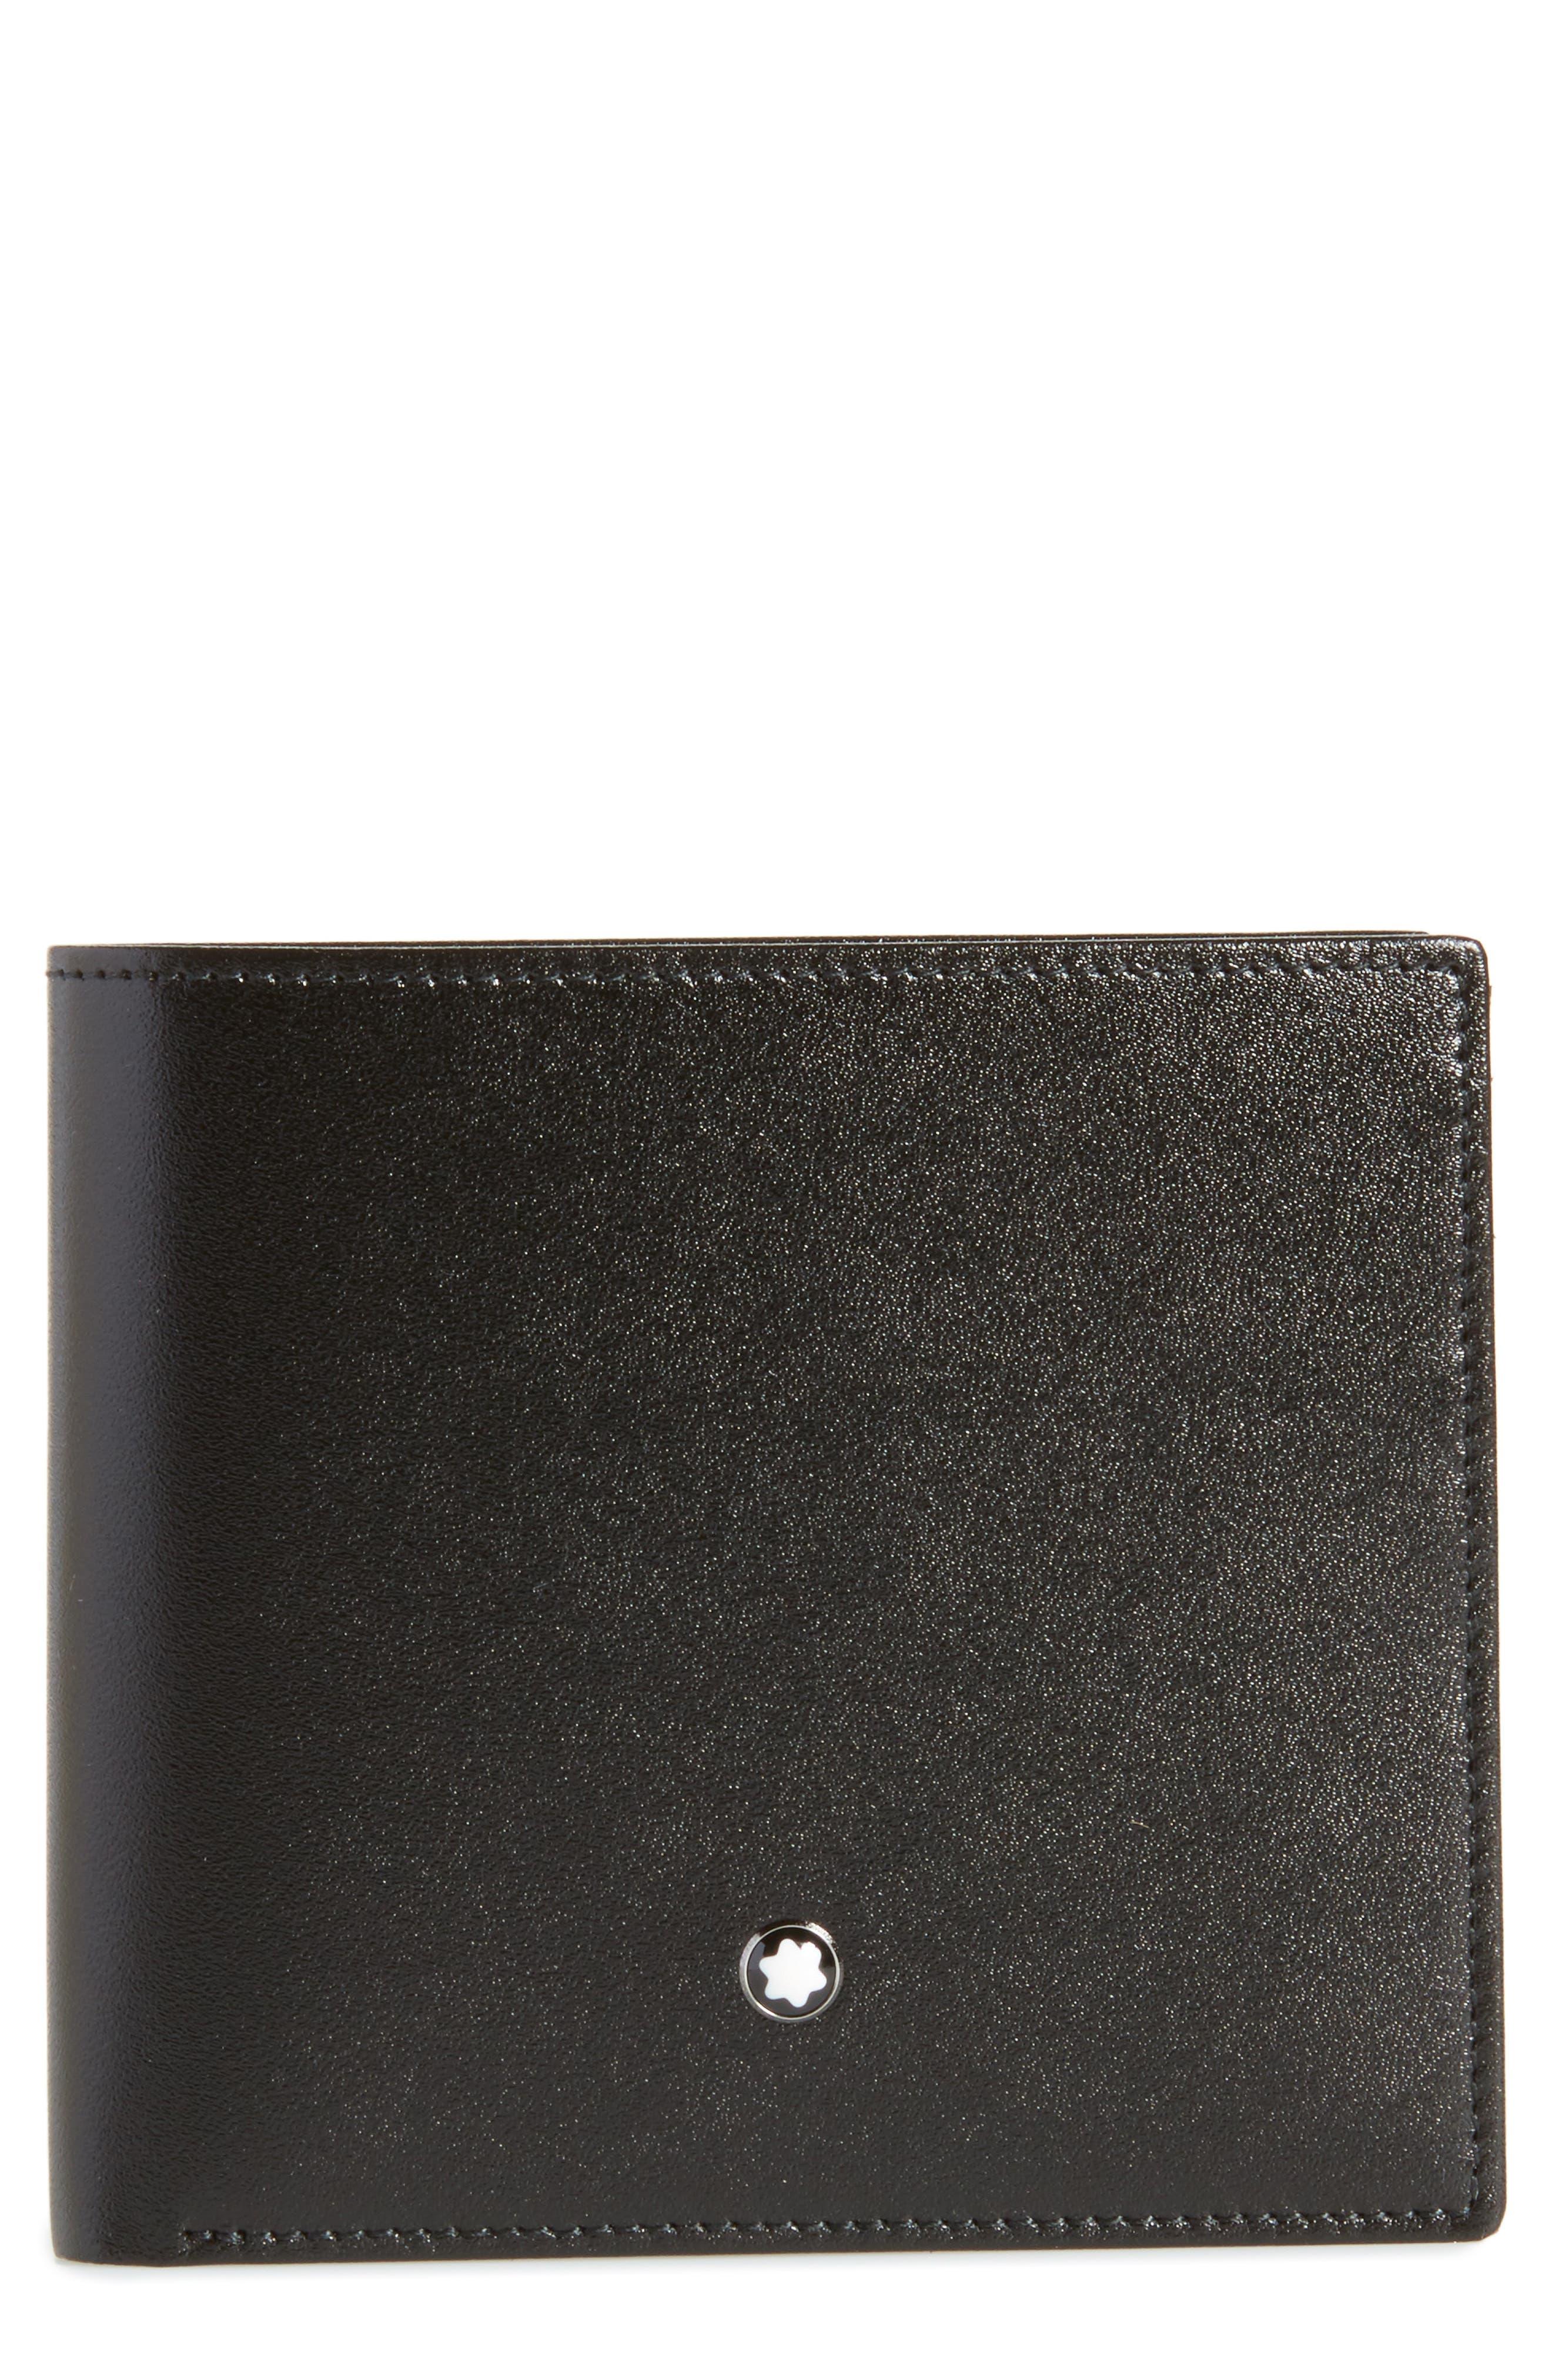 Main Image - MONTBLANC Meisterstück Leather Wallet